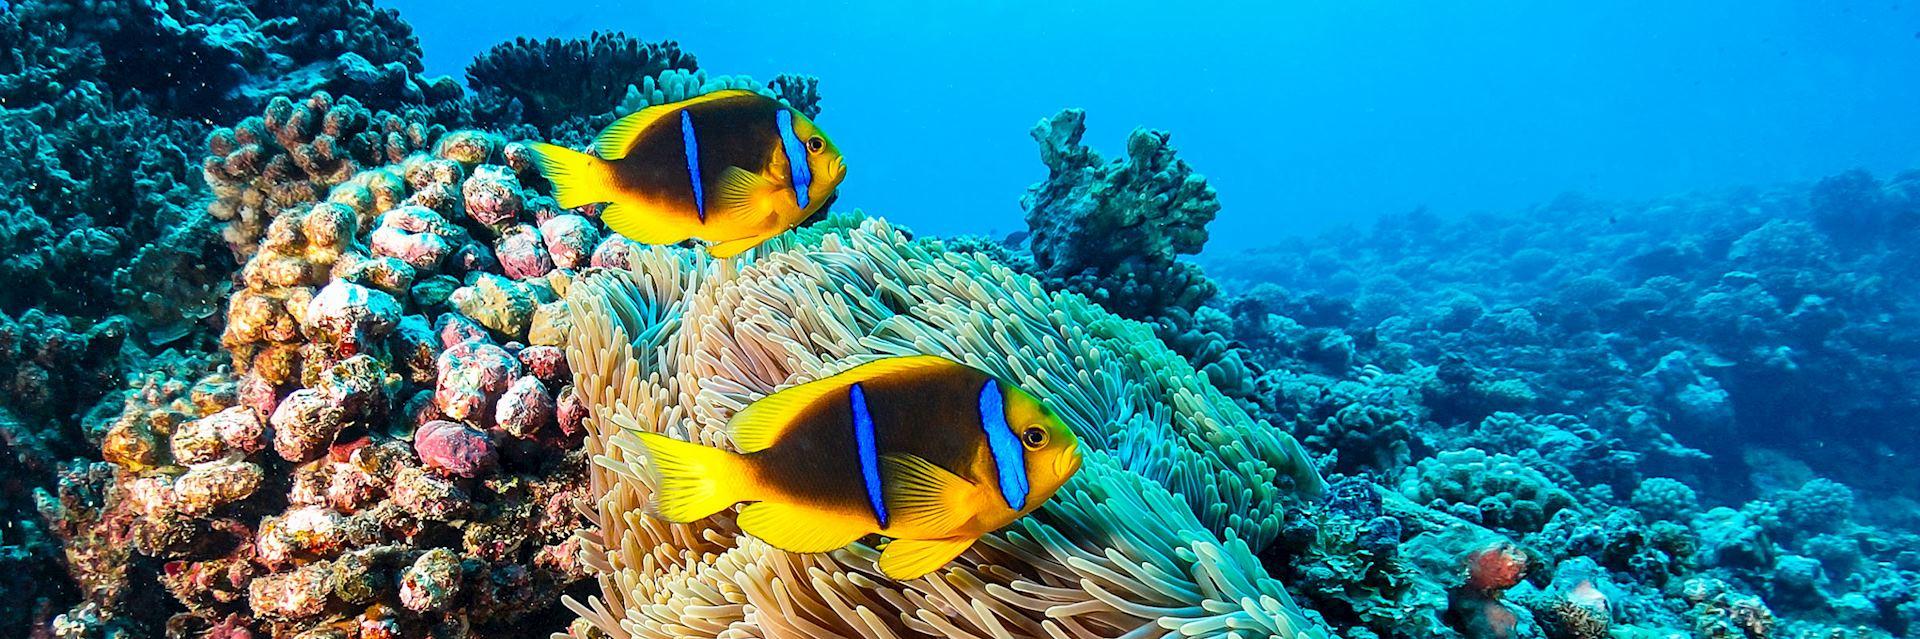 Marine life, French Polynesia